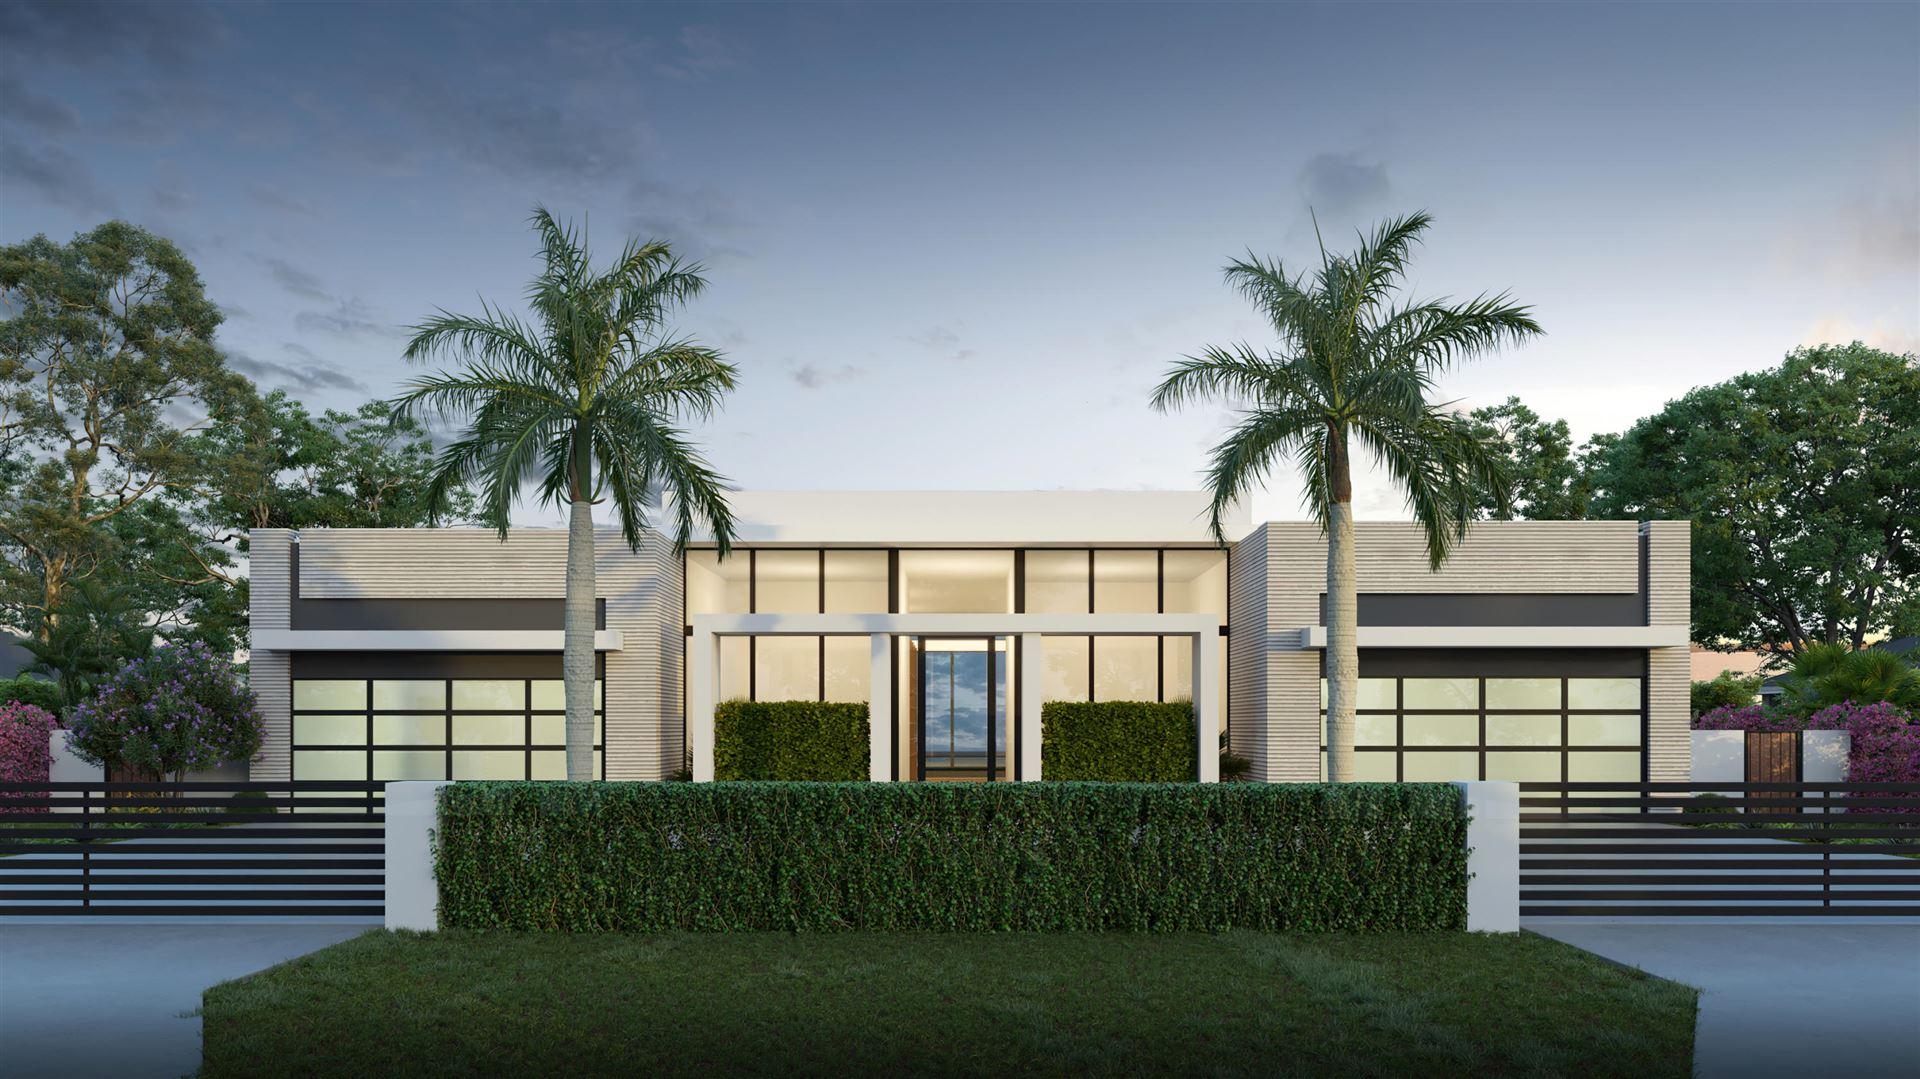 1801 Spanish River Road, Boca Raton, FL 33432 - MLS#: RX-10726705